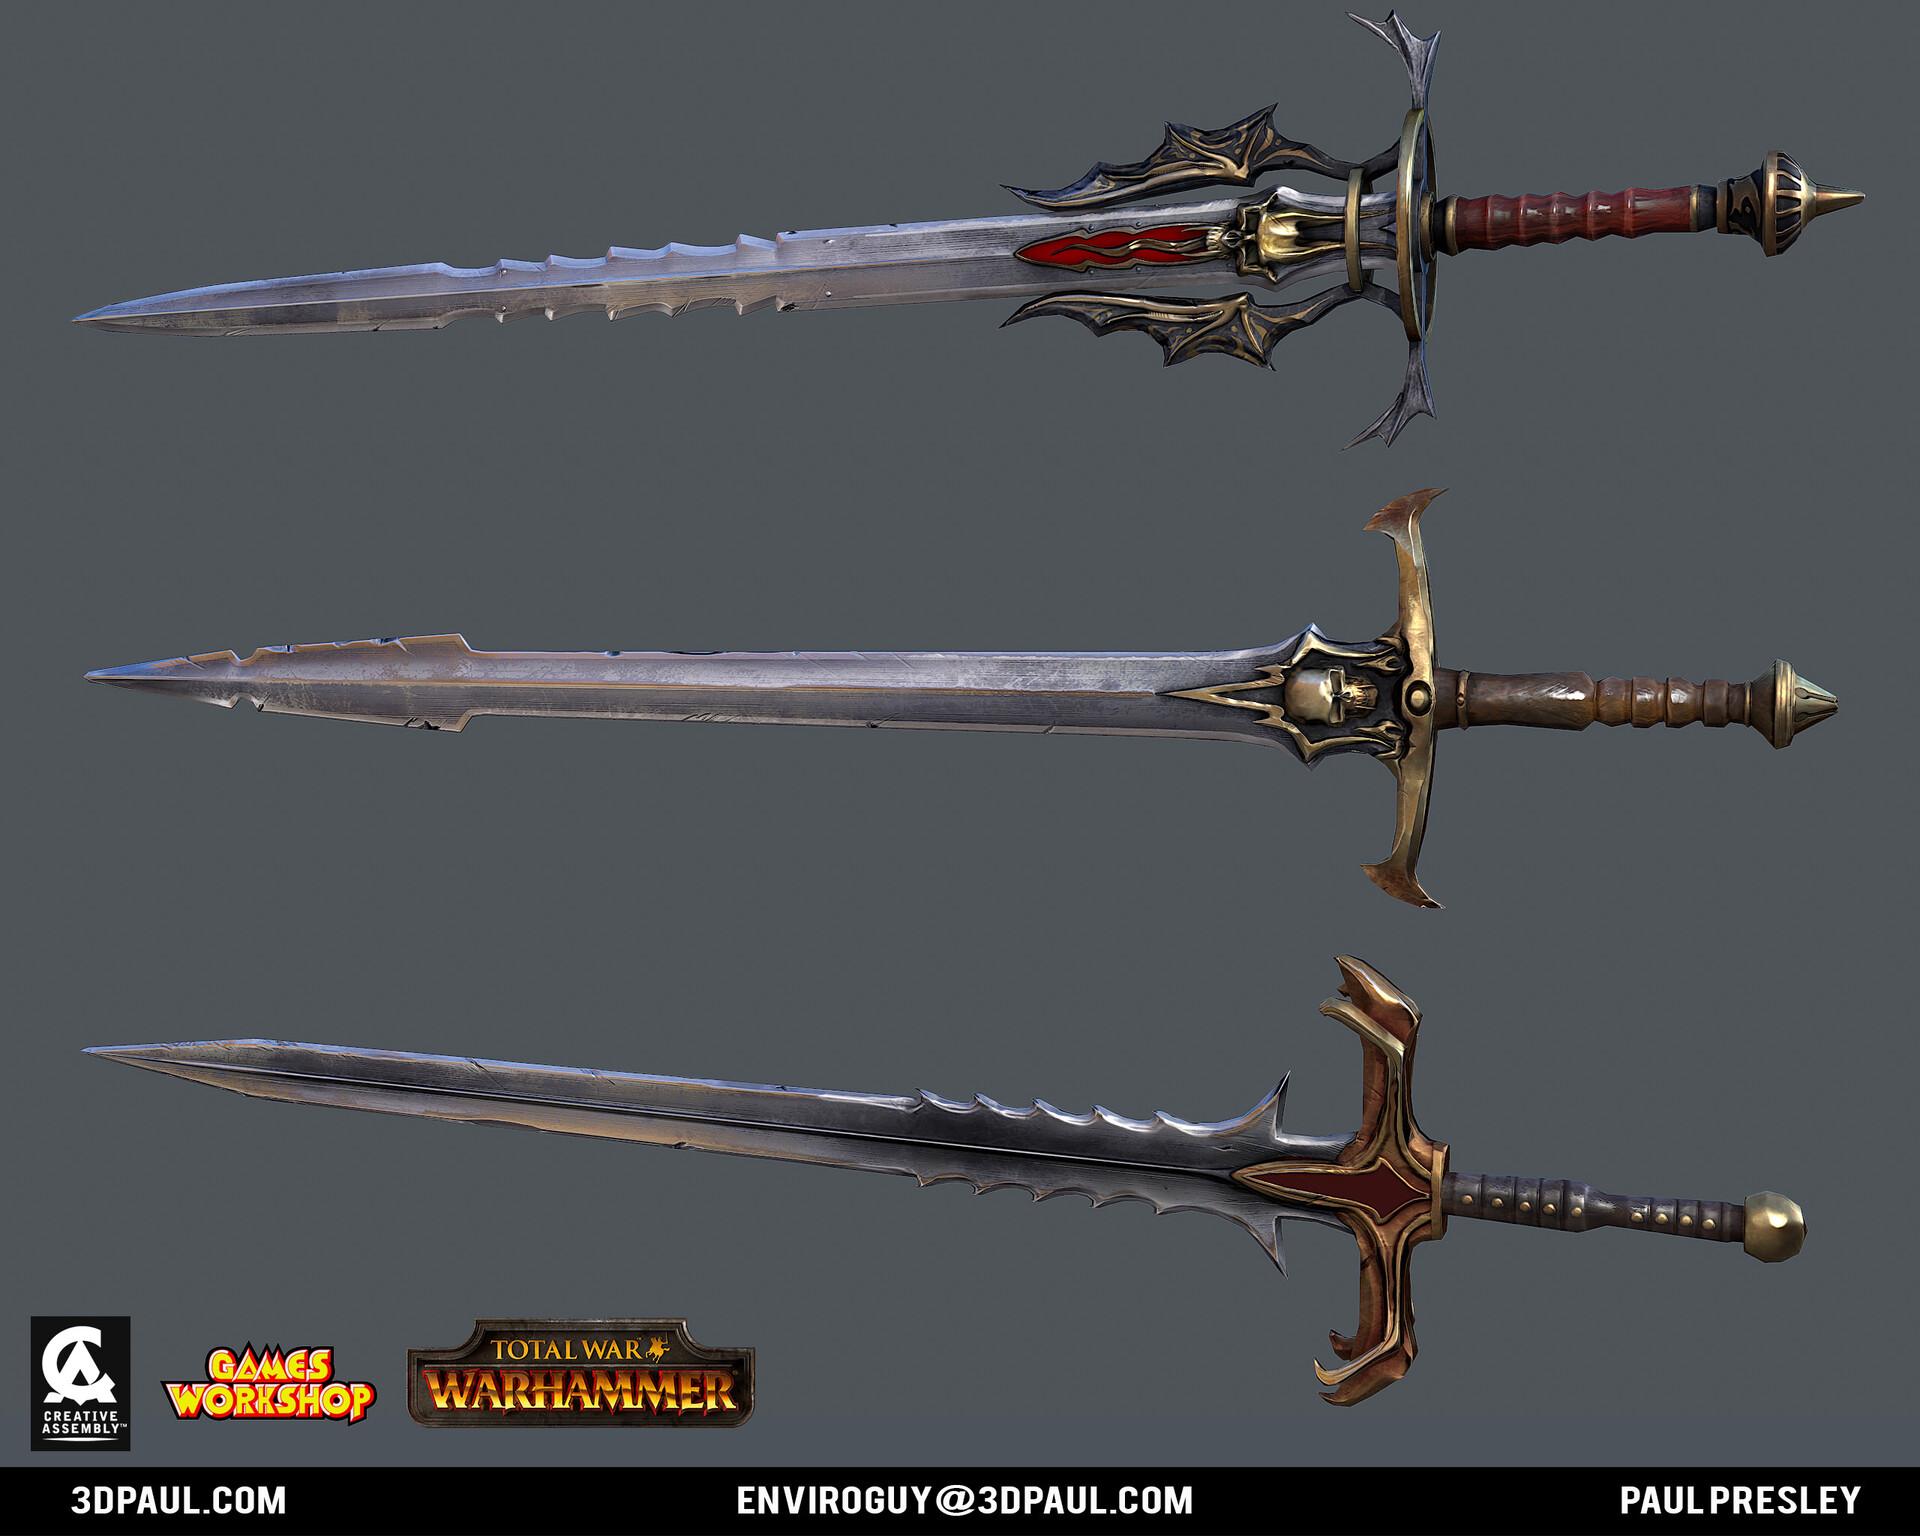 Paul presley ca vamp 02 sword